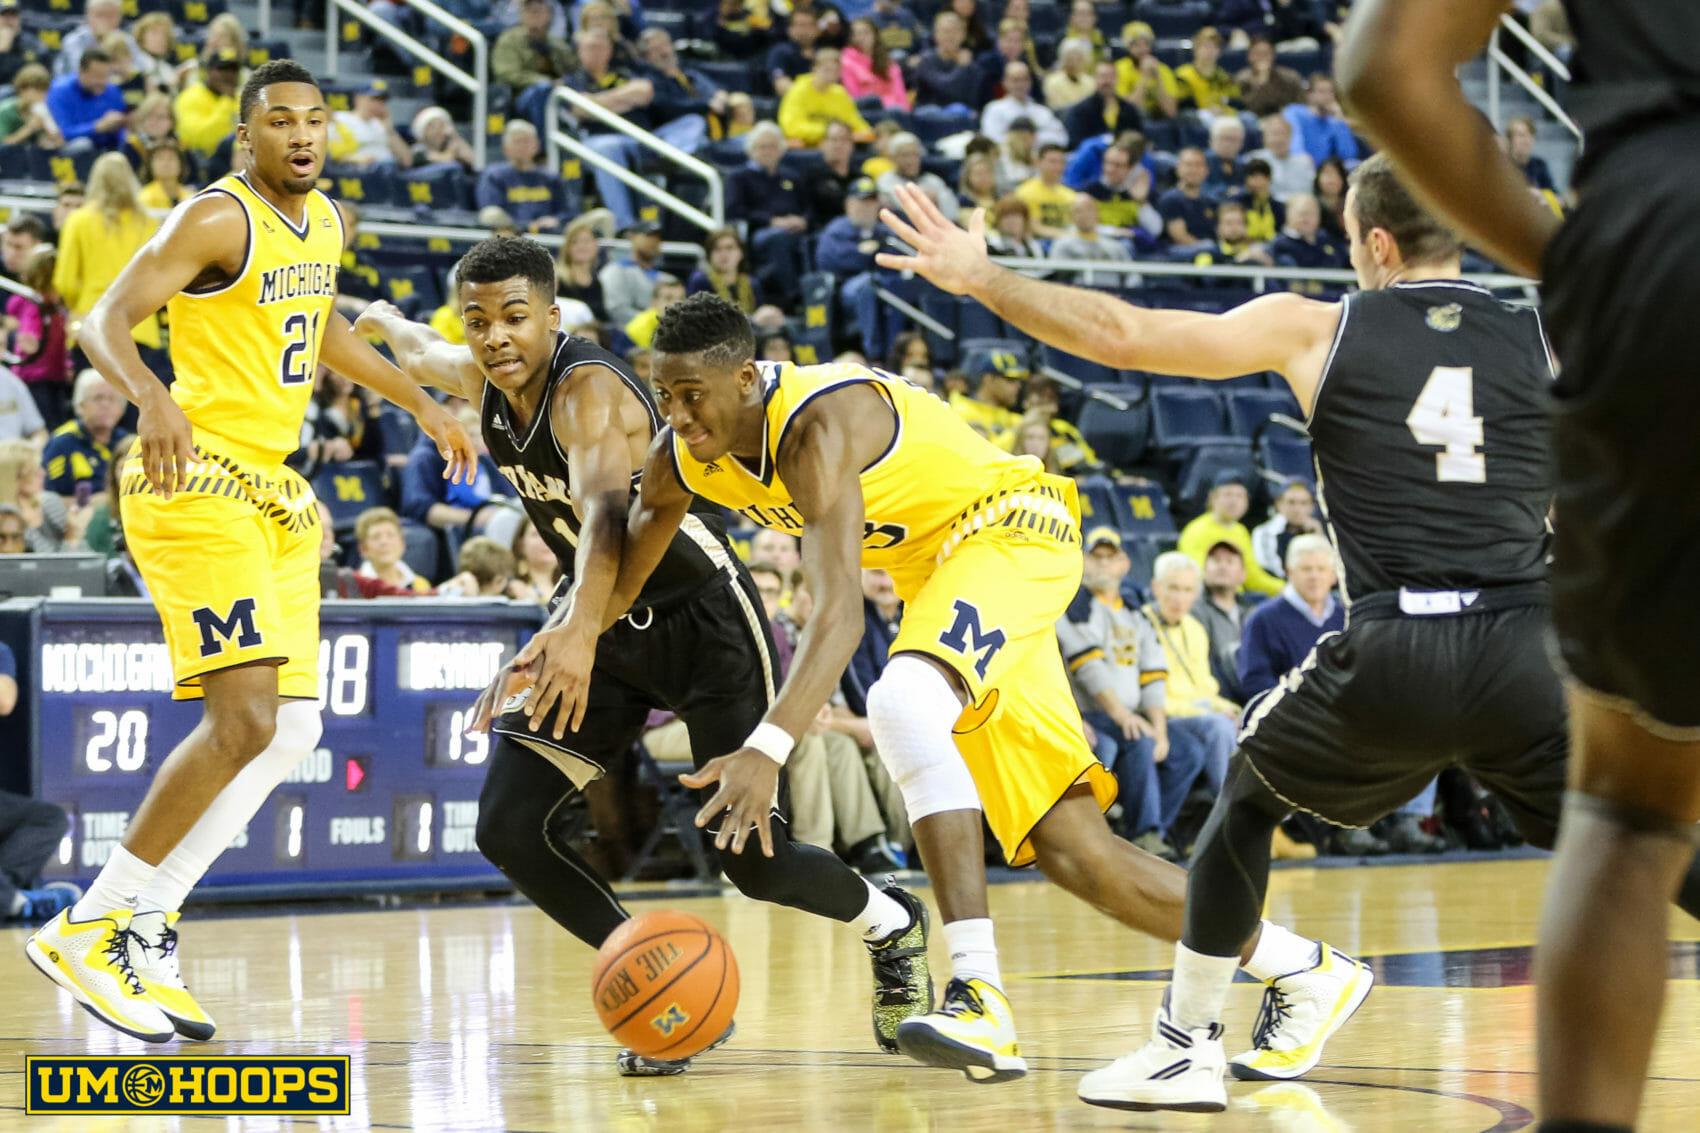 Michigan 96, Bryant 60-5